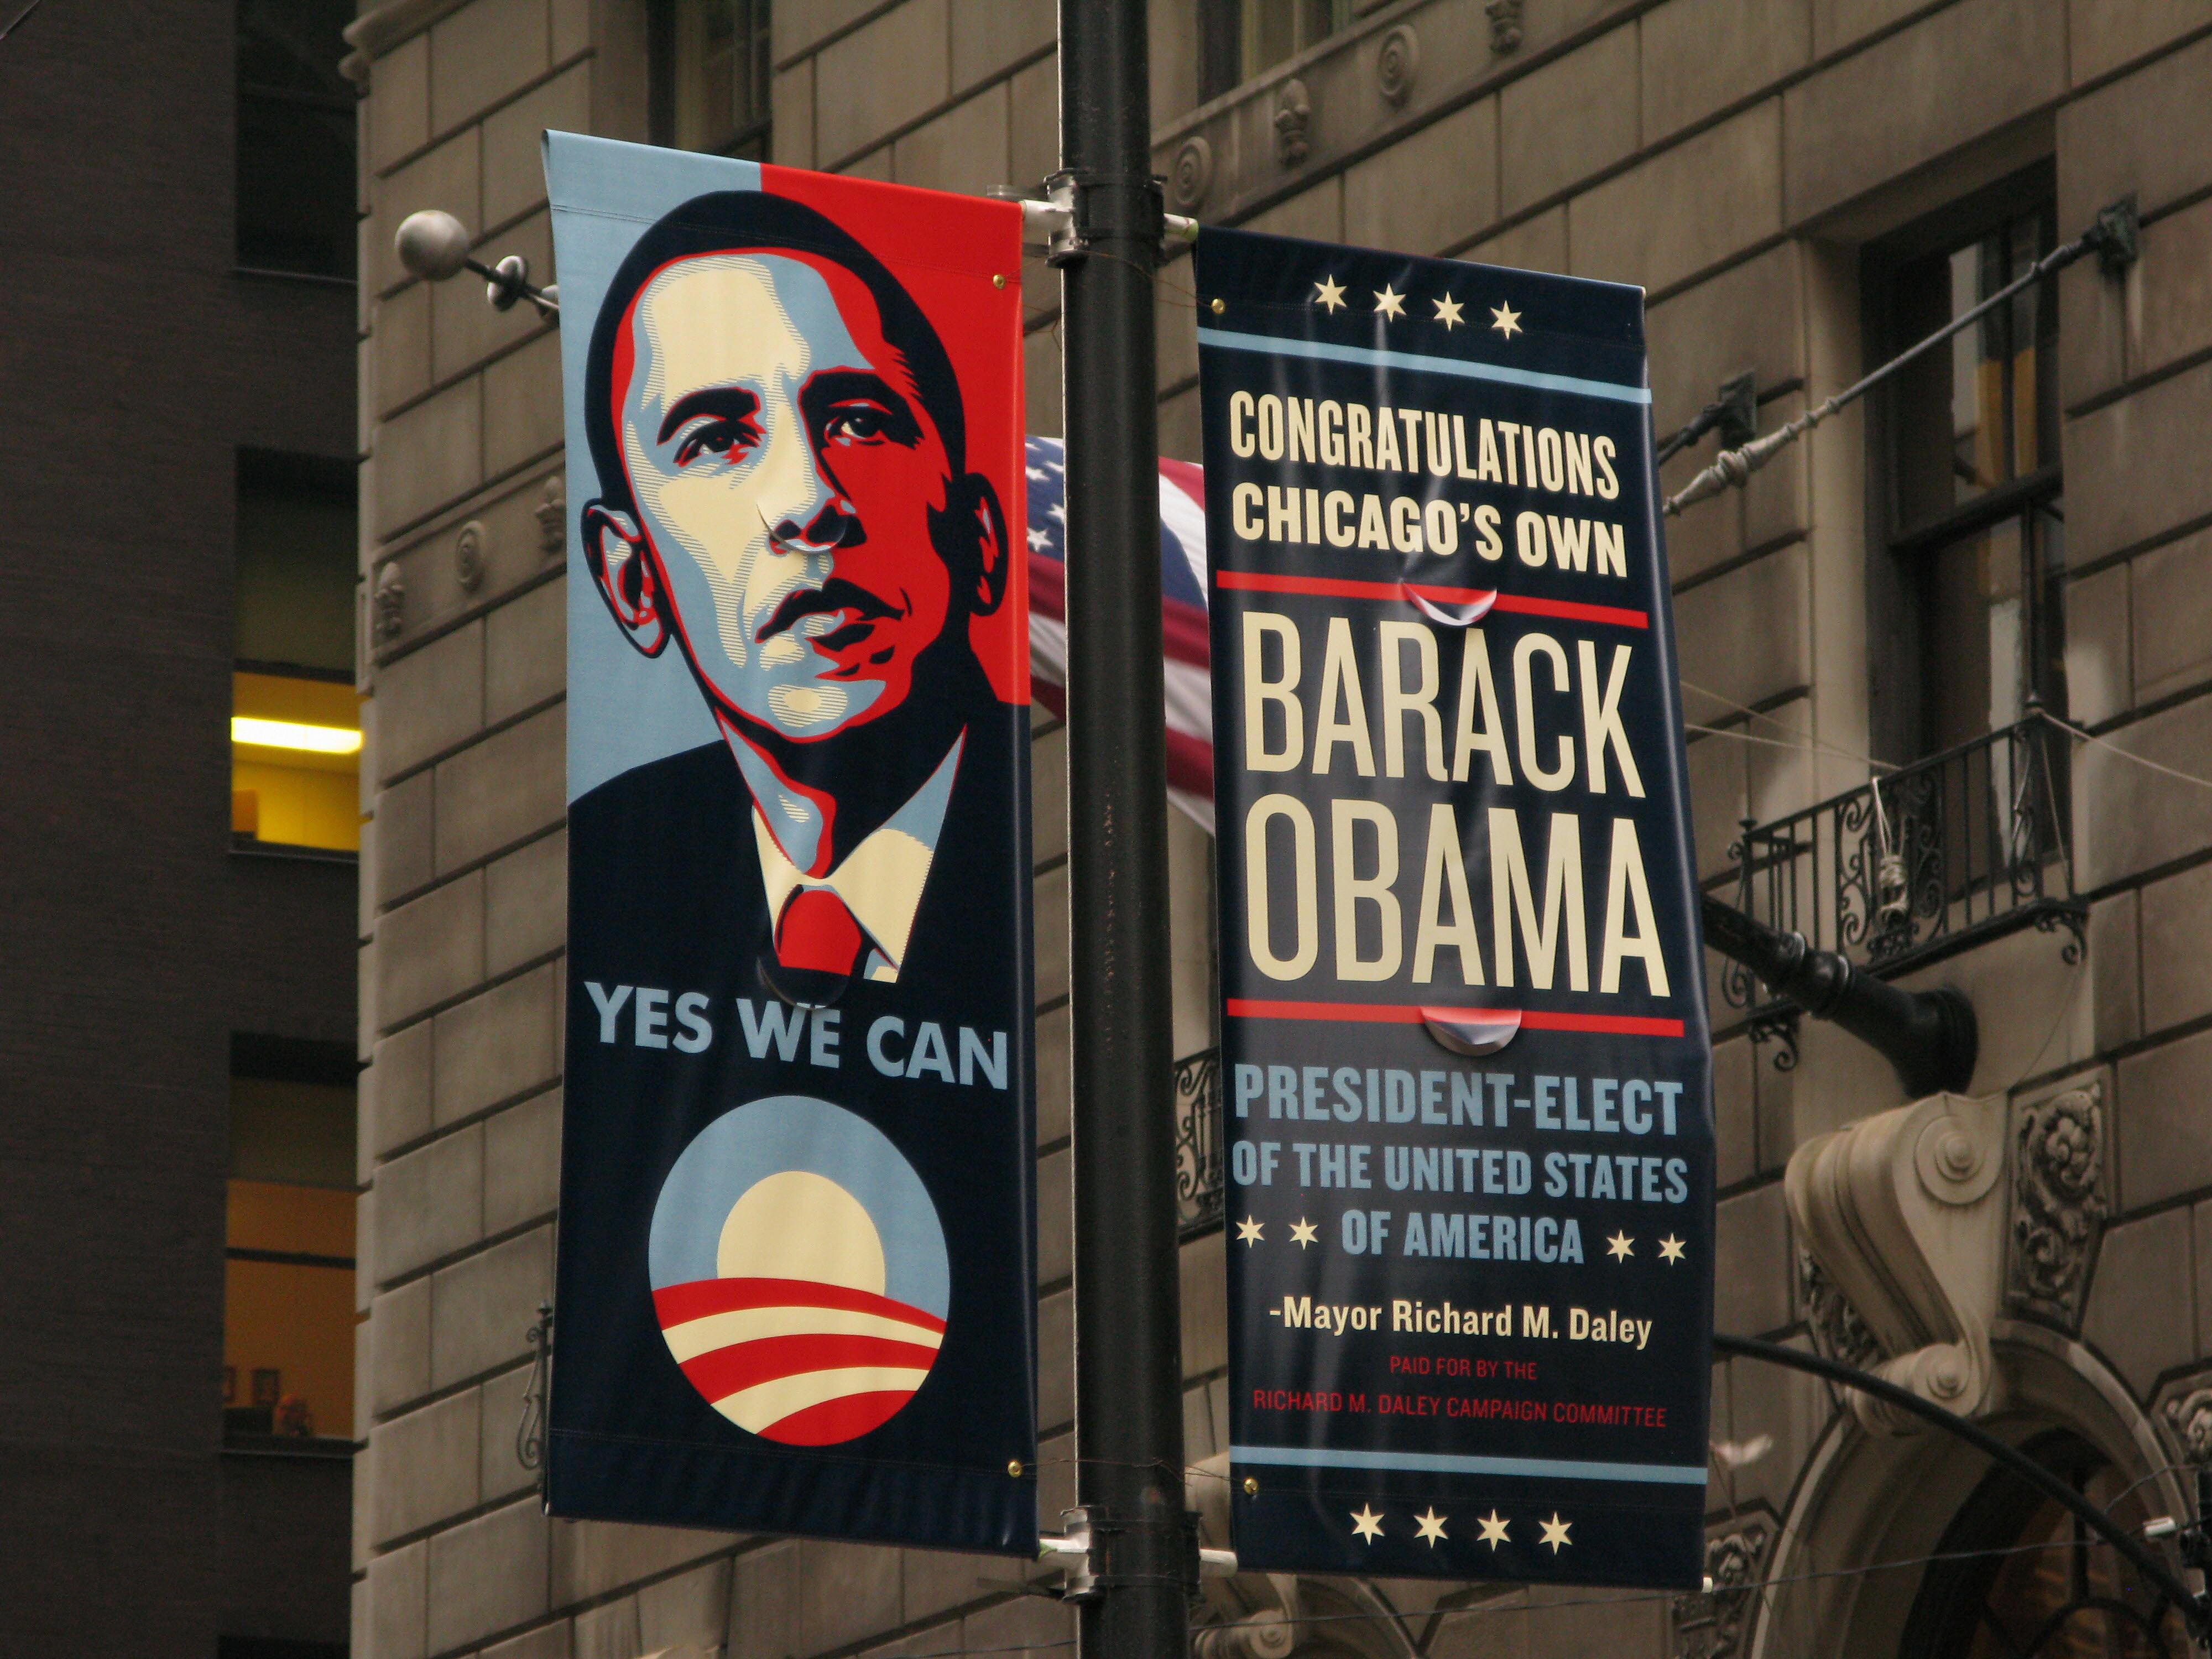 Obama Hope Artist S Orwellian Take On Donald Trump Cnn Style